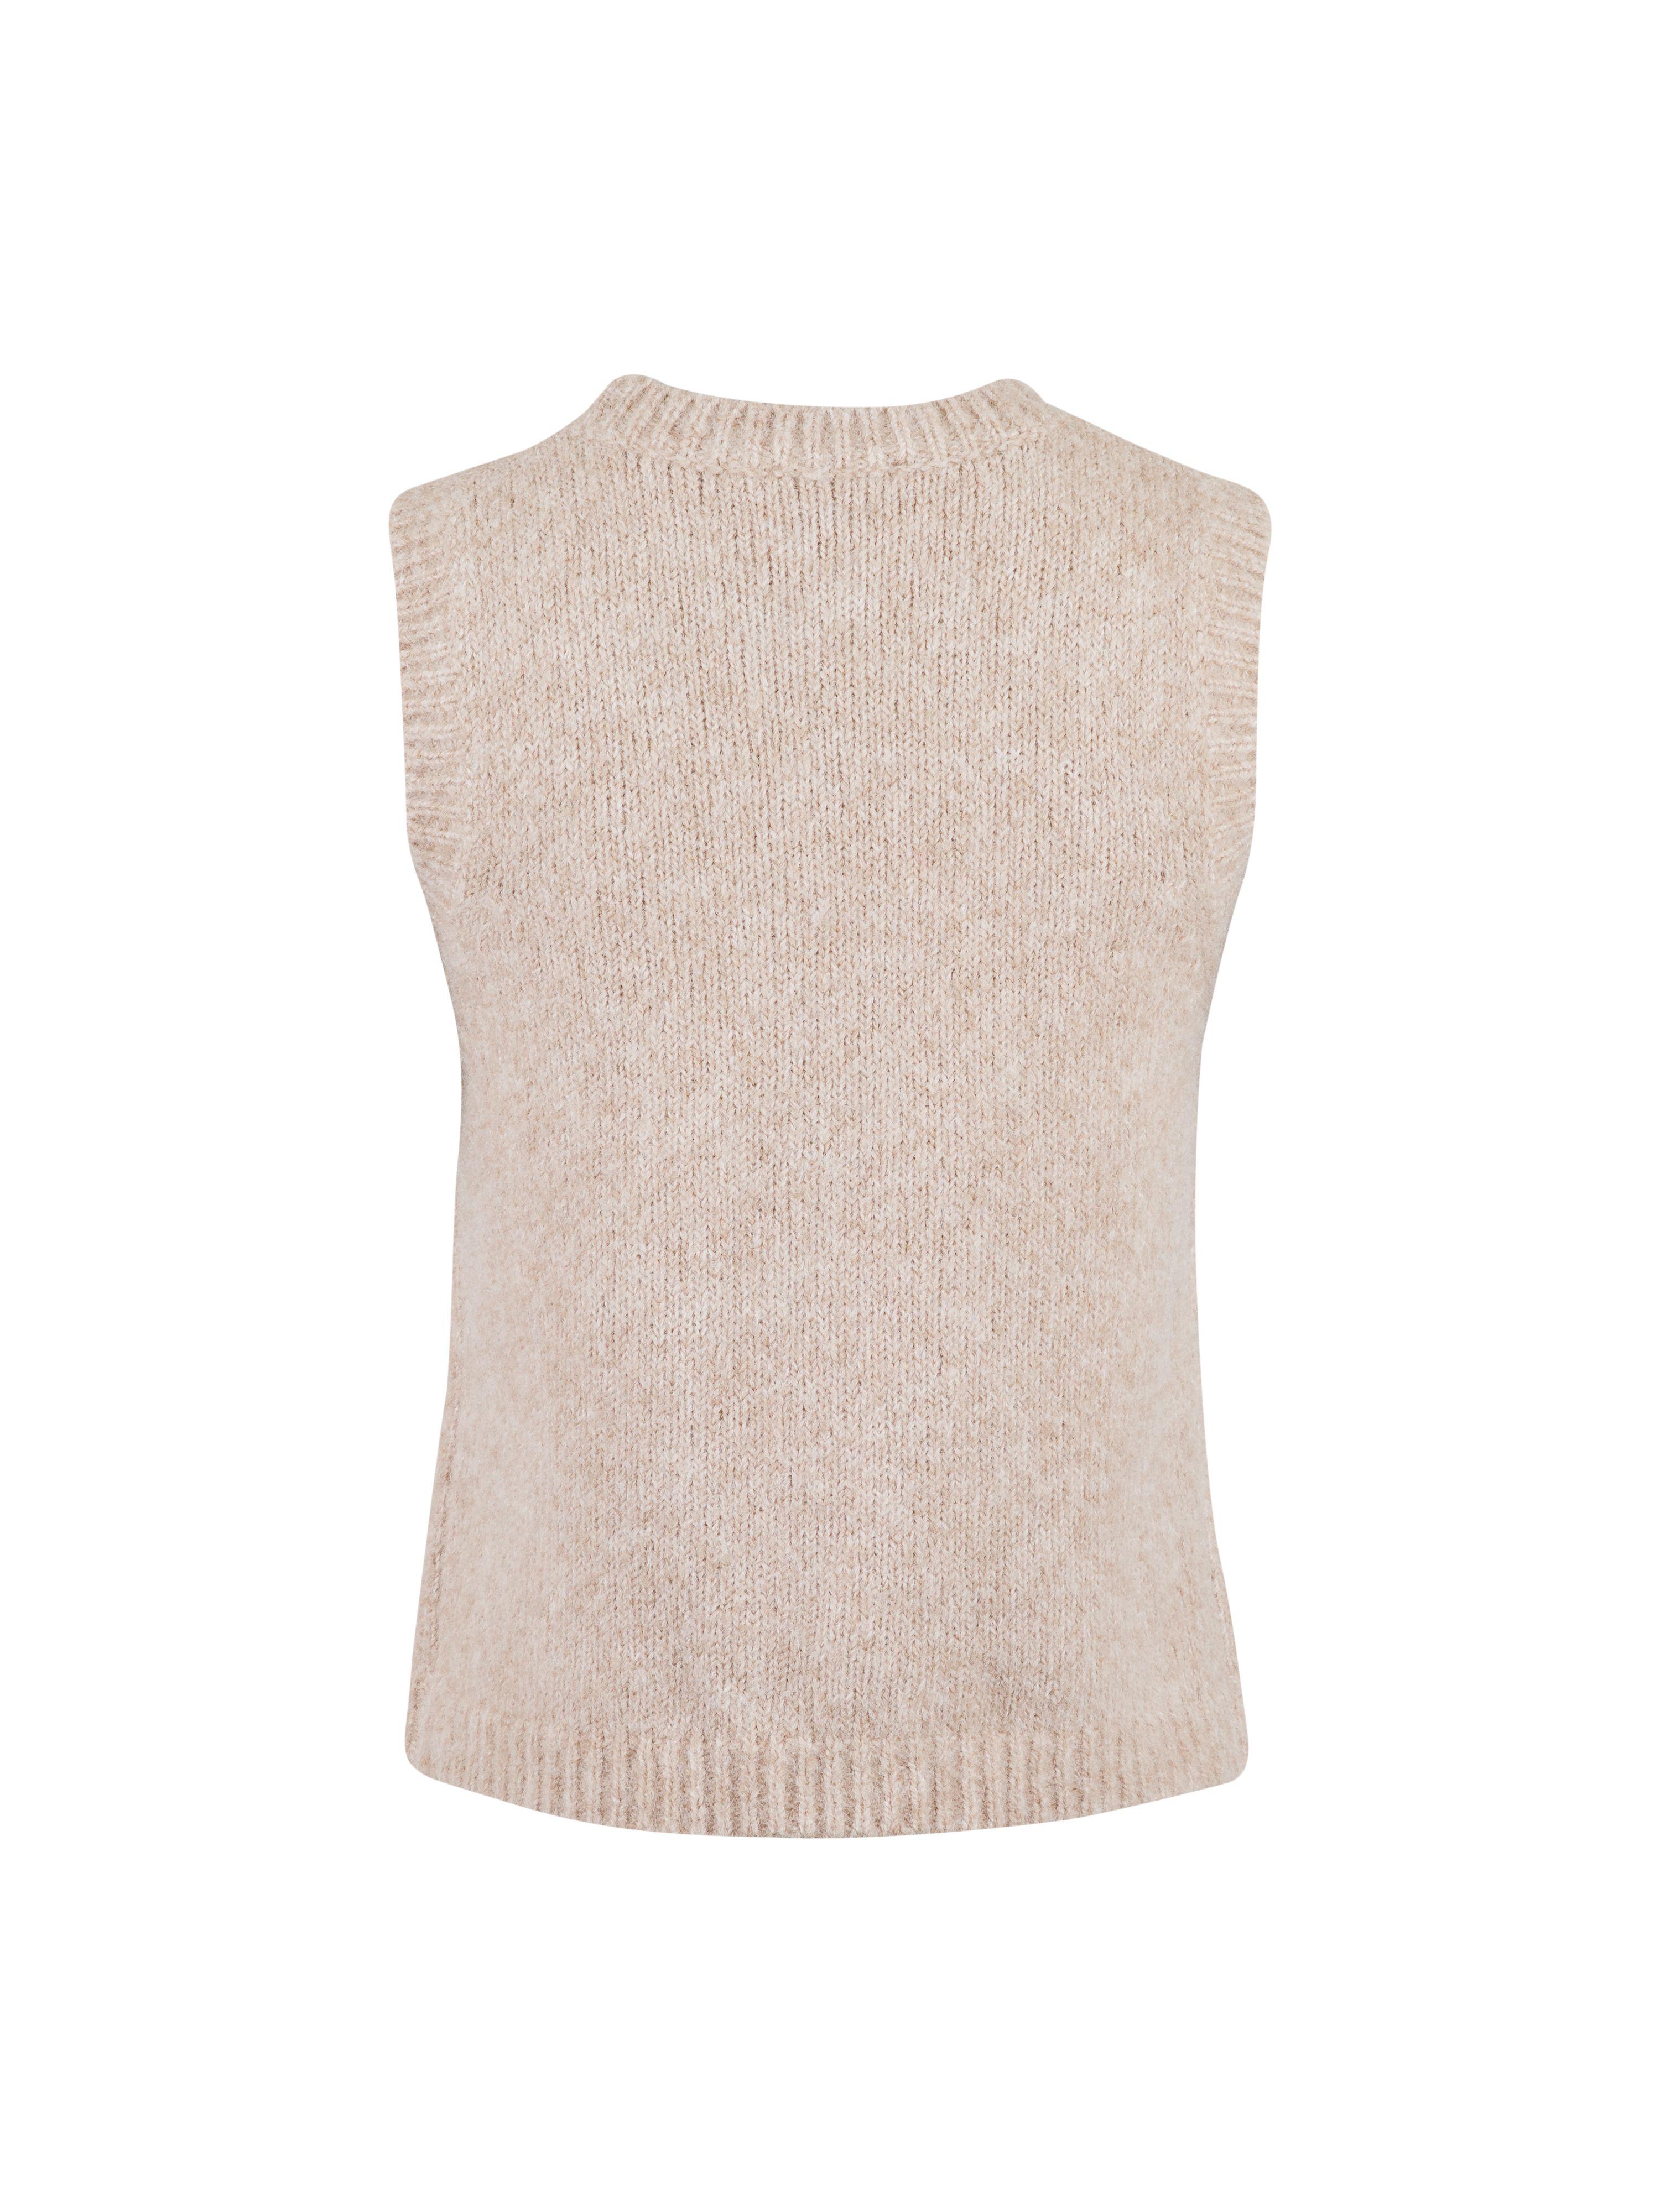 Neo Noir Franko strik vest, sand, x-large